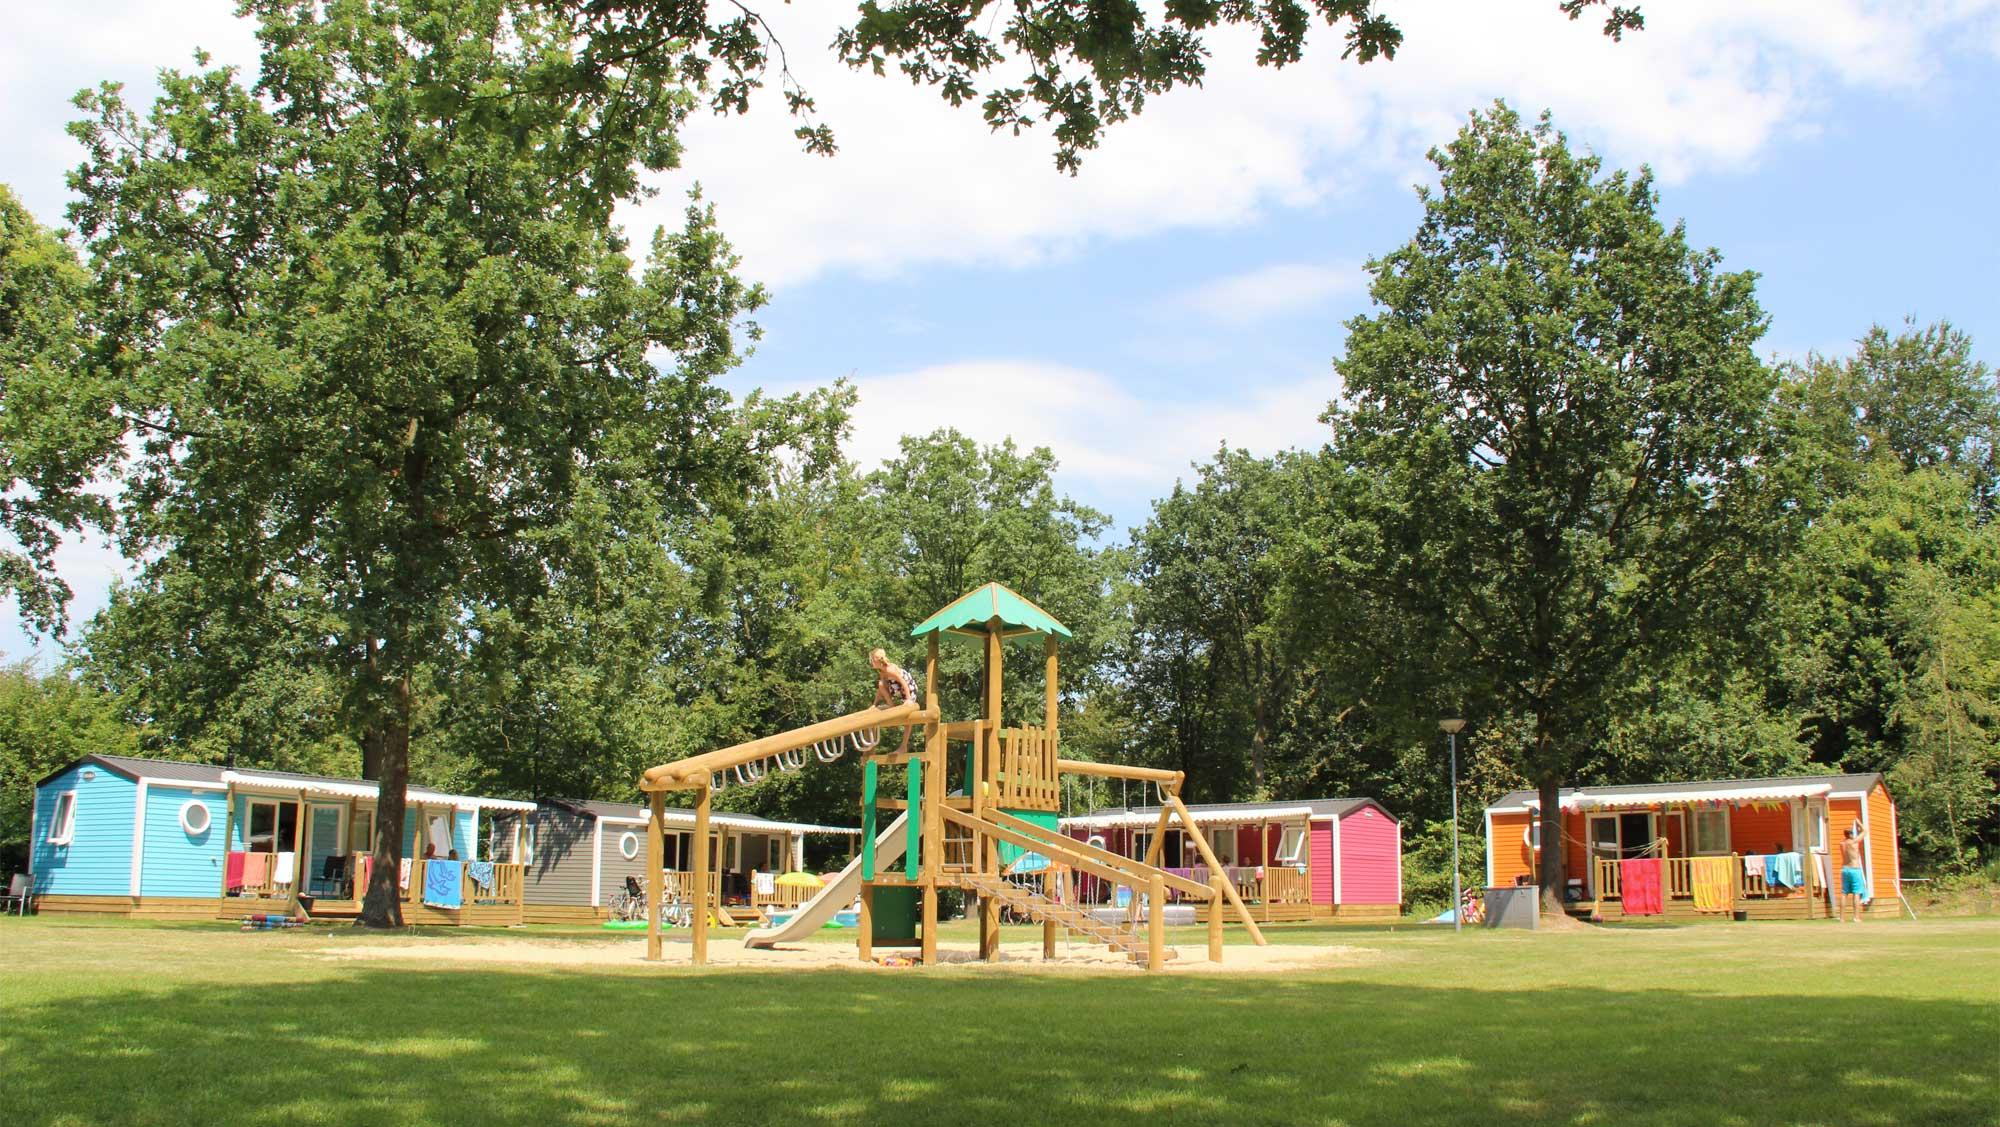 6pers chalet Lupine Molecaten Park Bosbad Hoeven 04